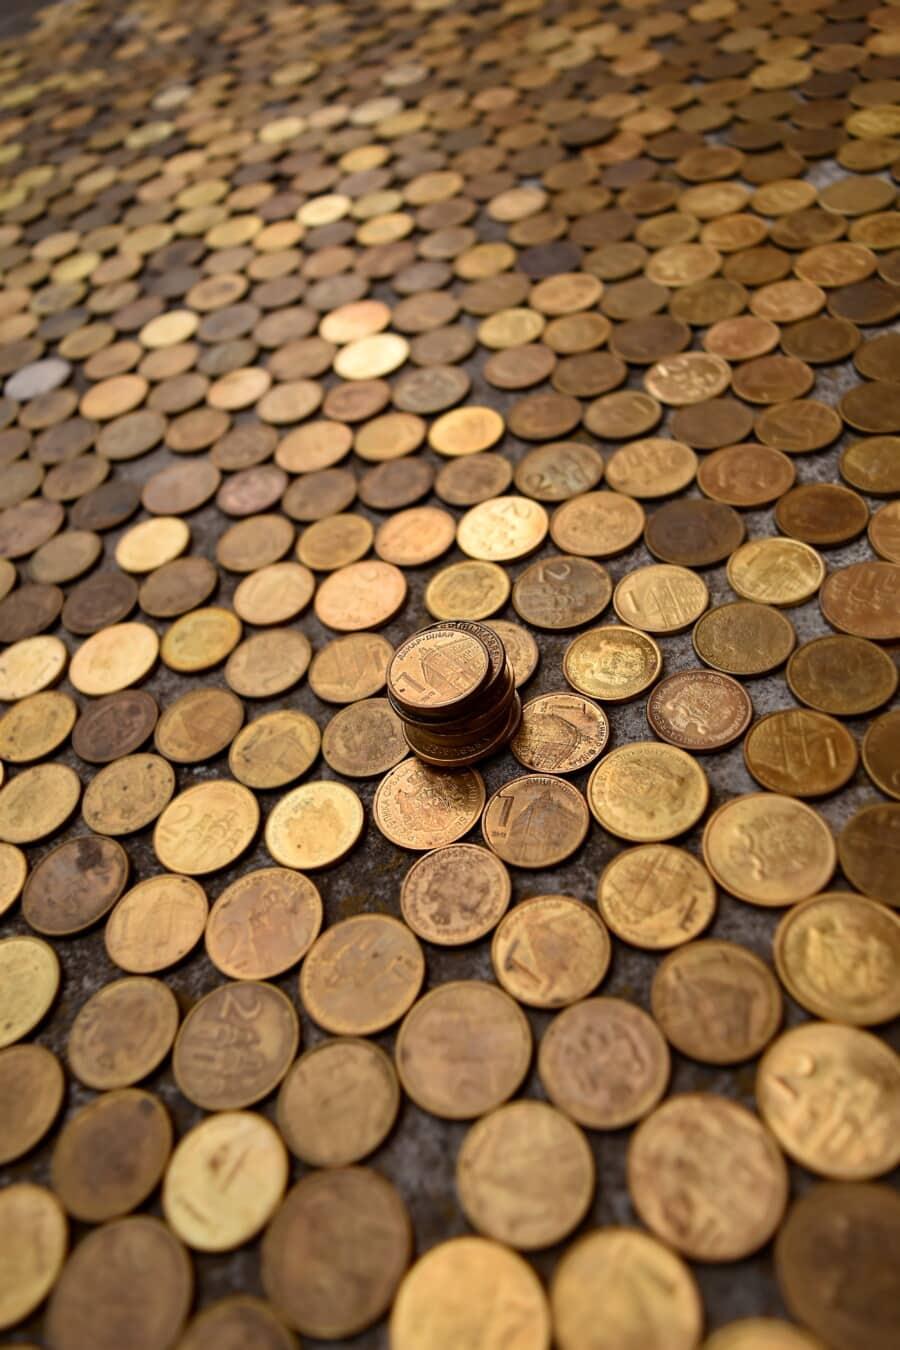 money, coins, metal, texture, brass, Serbia, cash, savings, bark, stacks